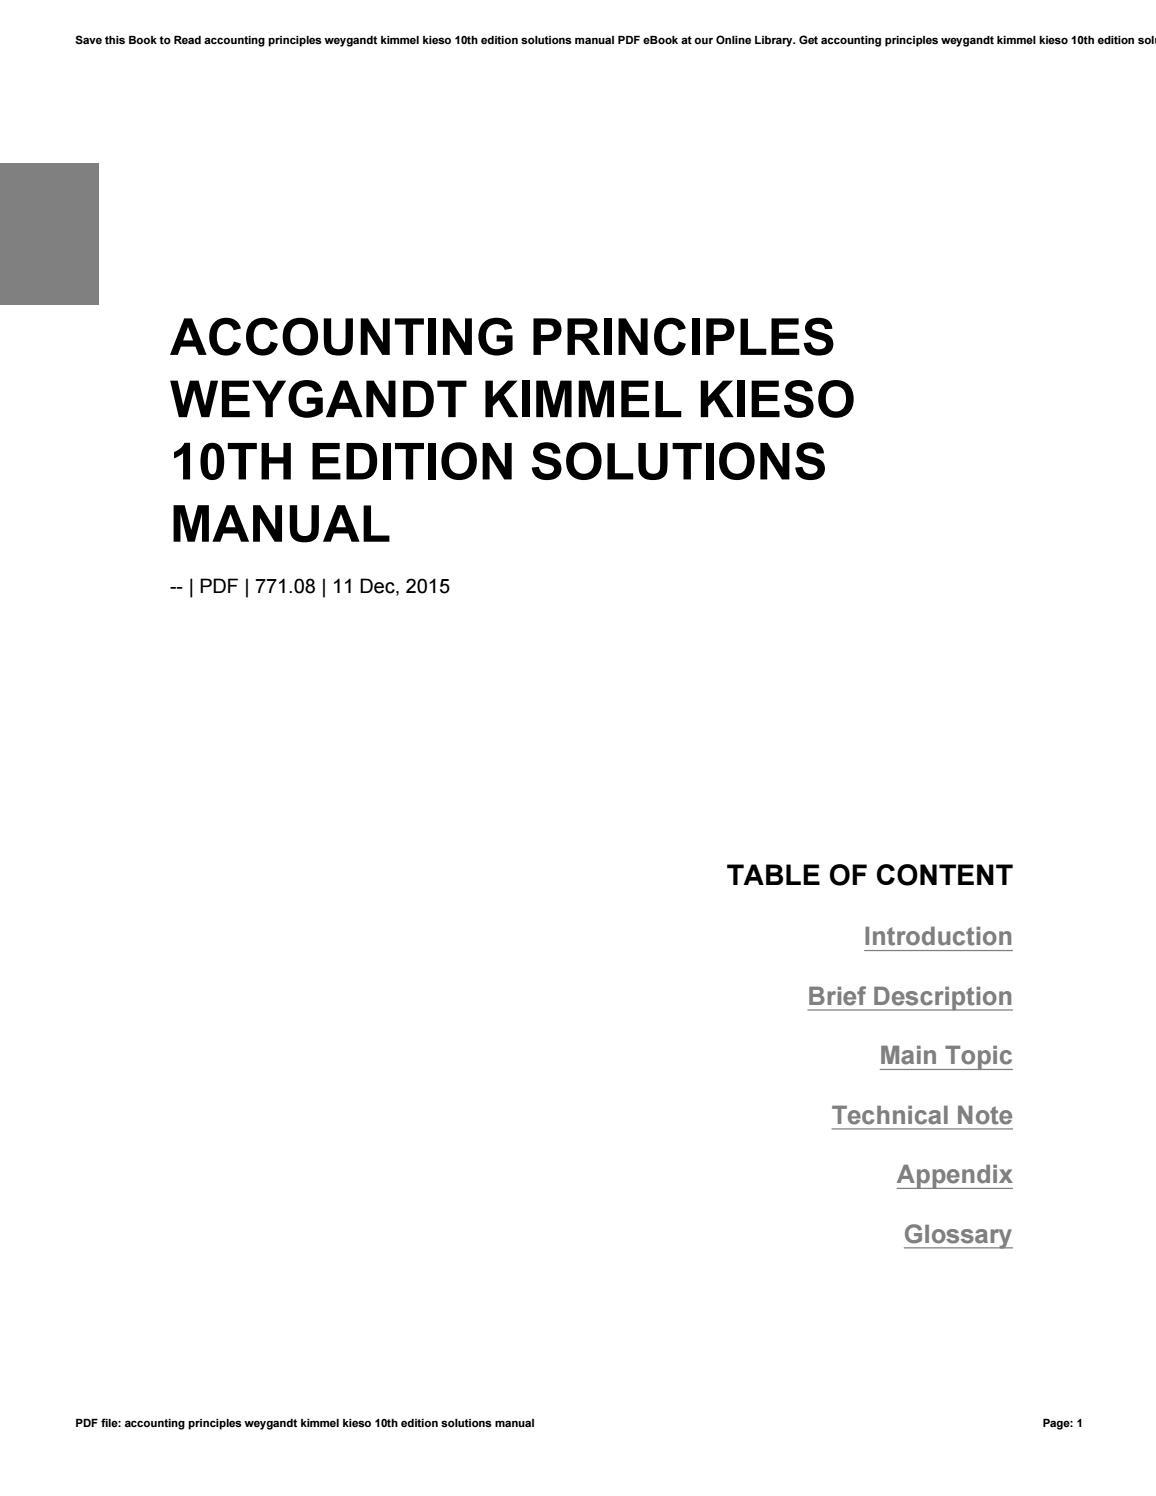 Accounting principles weygandt kimmel kieso 10th edition solutions manual  by farfurmail86 - issuu